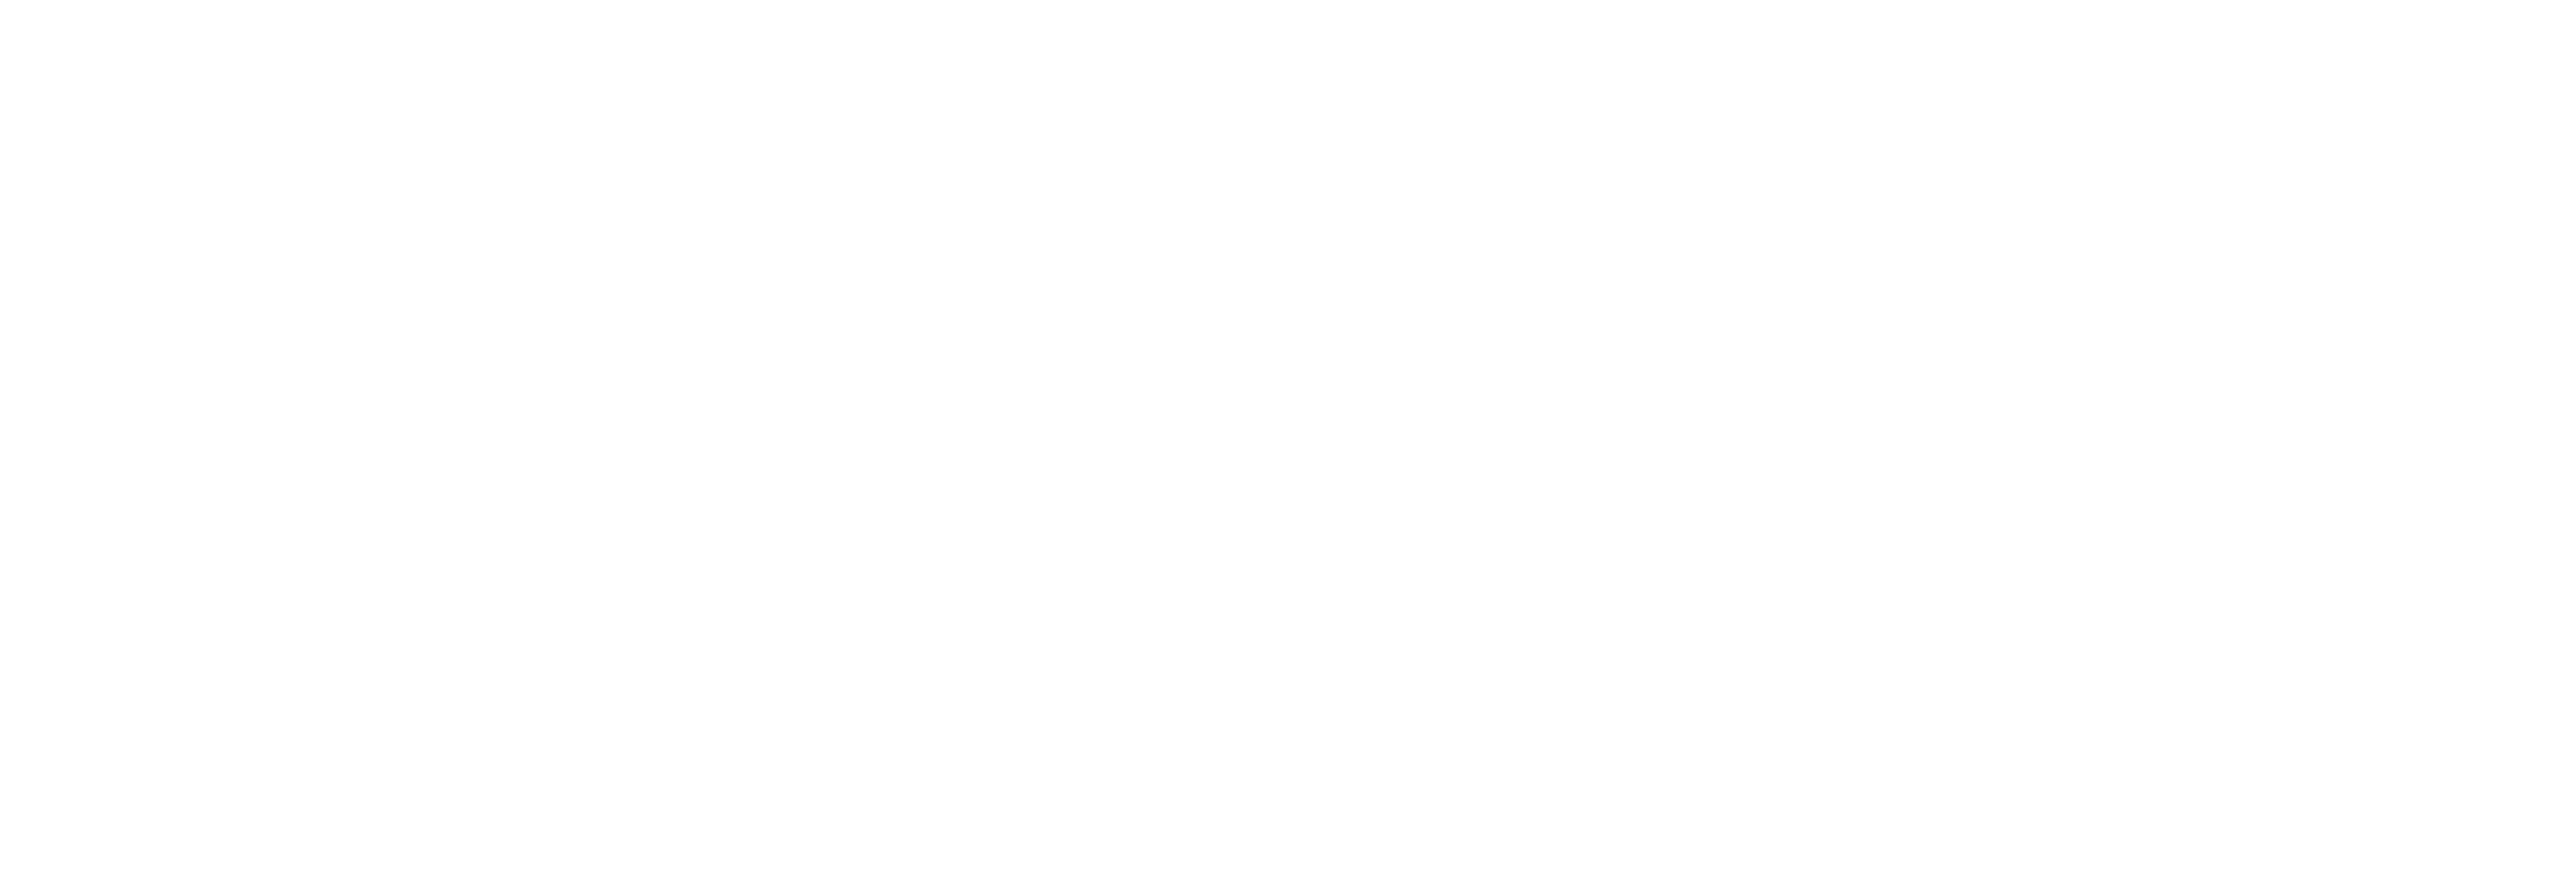 Equip logo in white